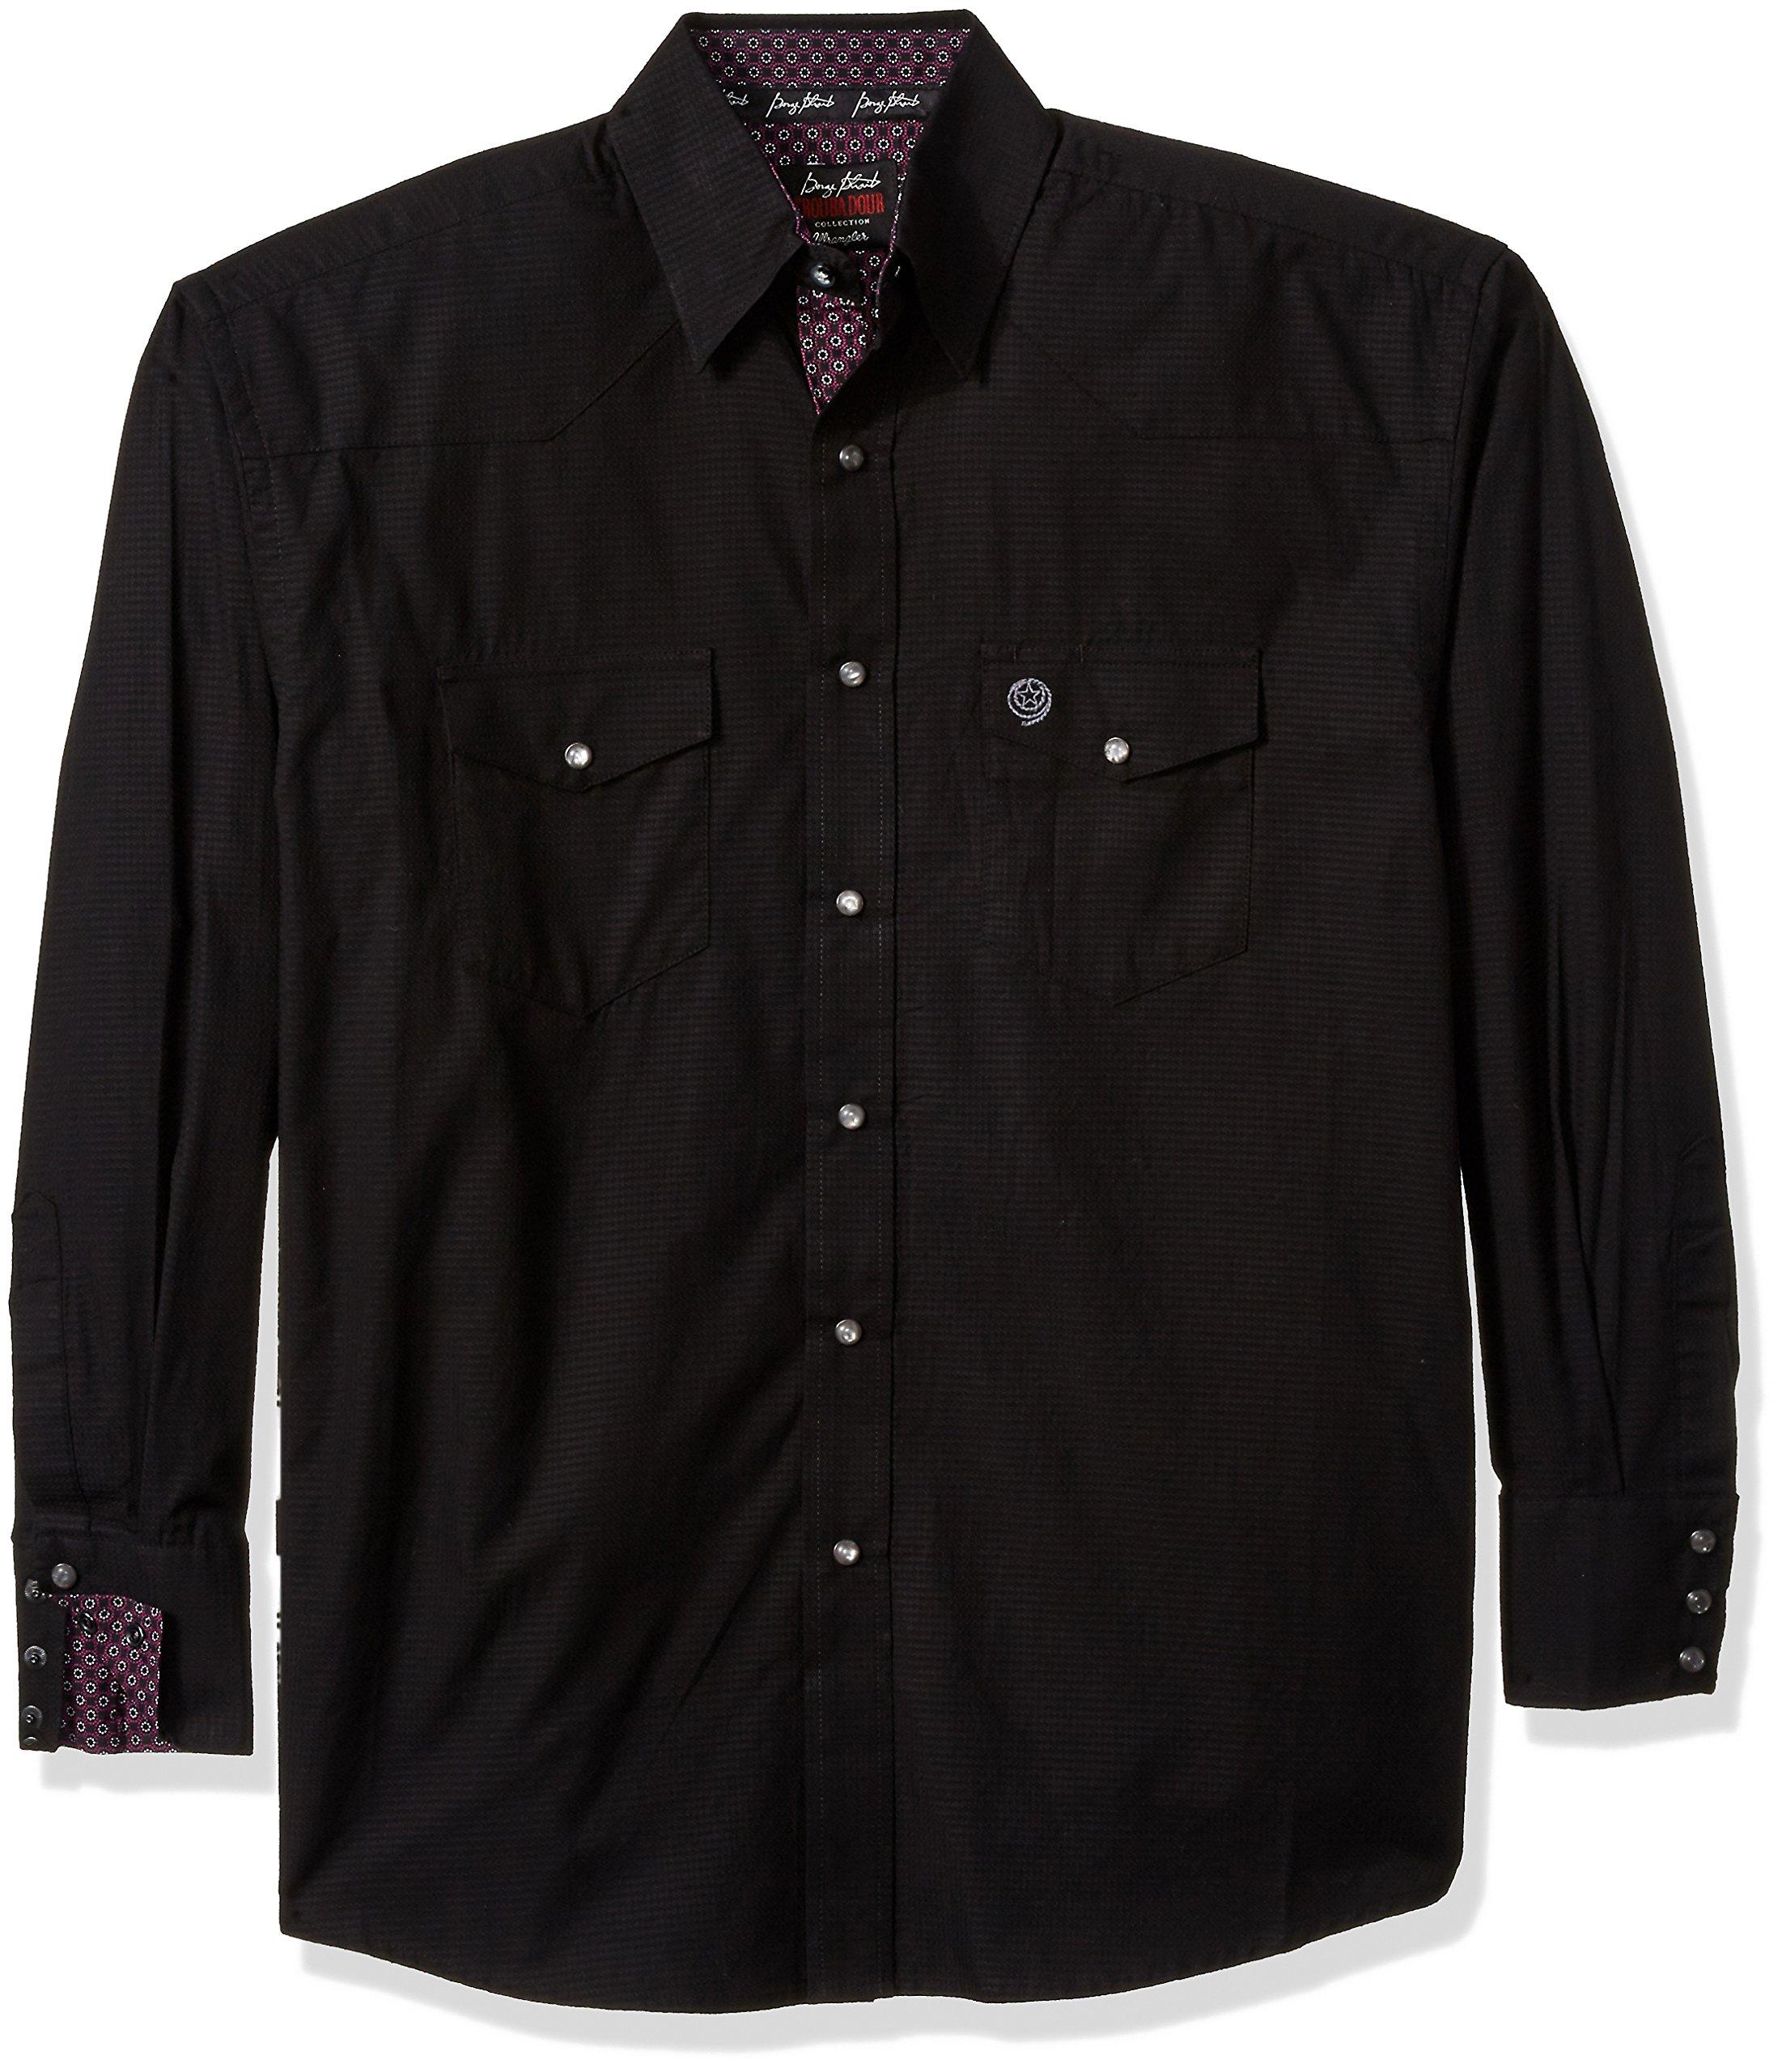 Wrangler Men's George Strait Troubadour Two Pocket Shirt, Black, M